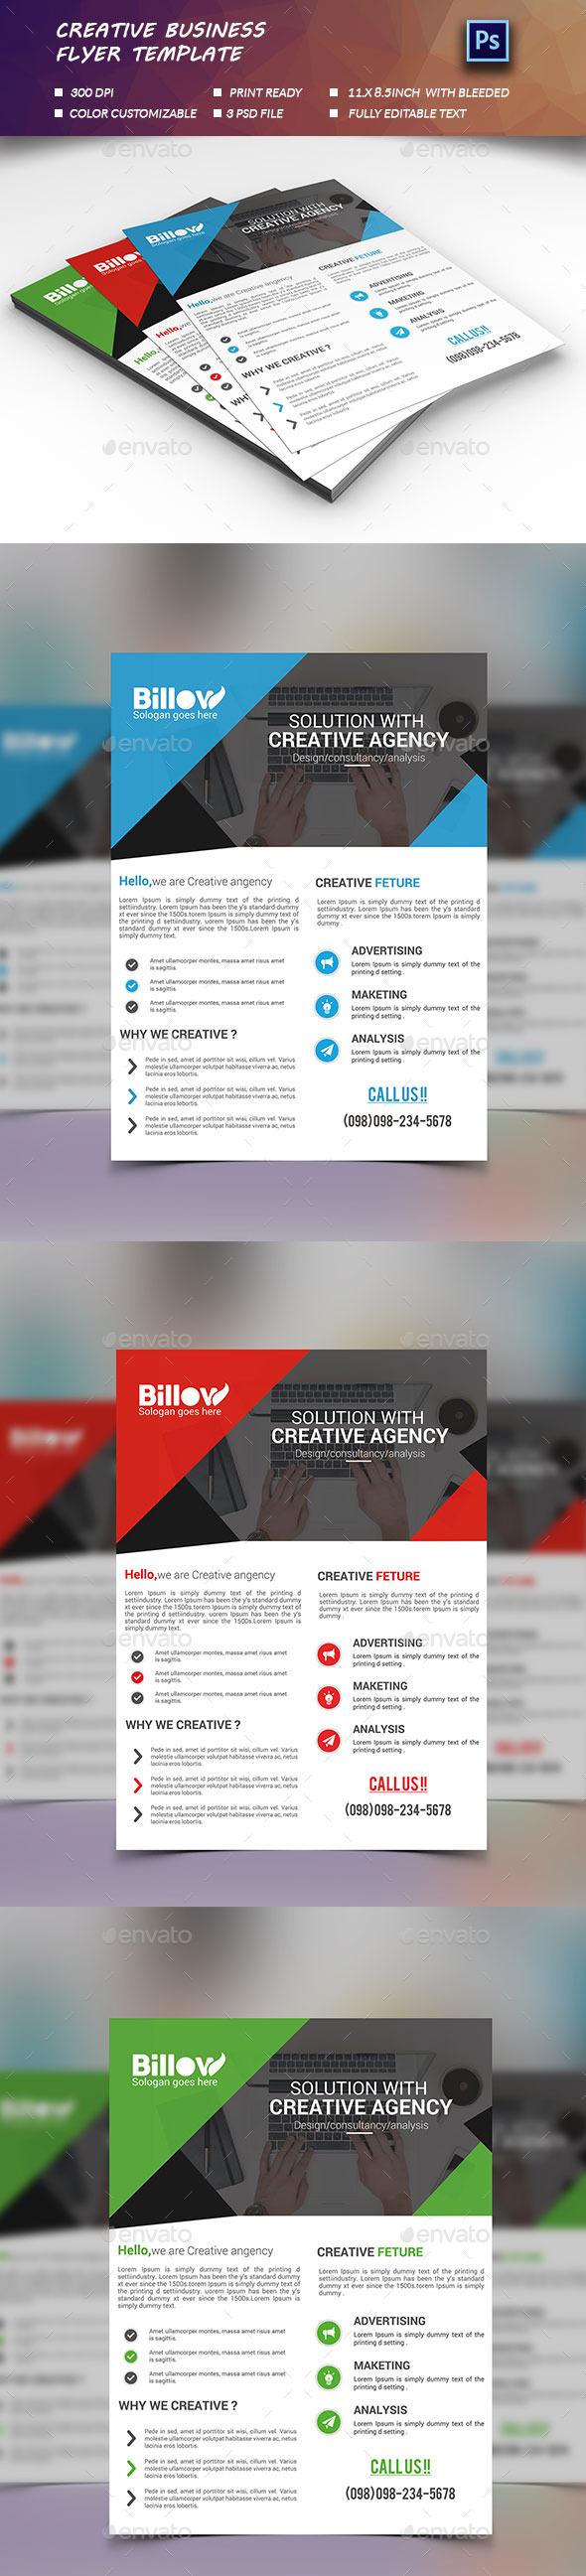 Creative Business Flyer  - Flyers Print Templates